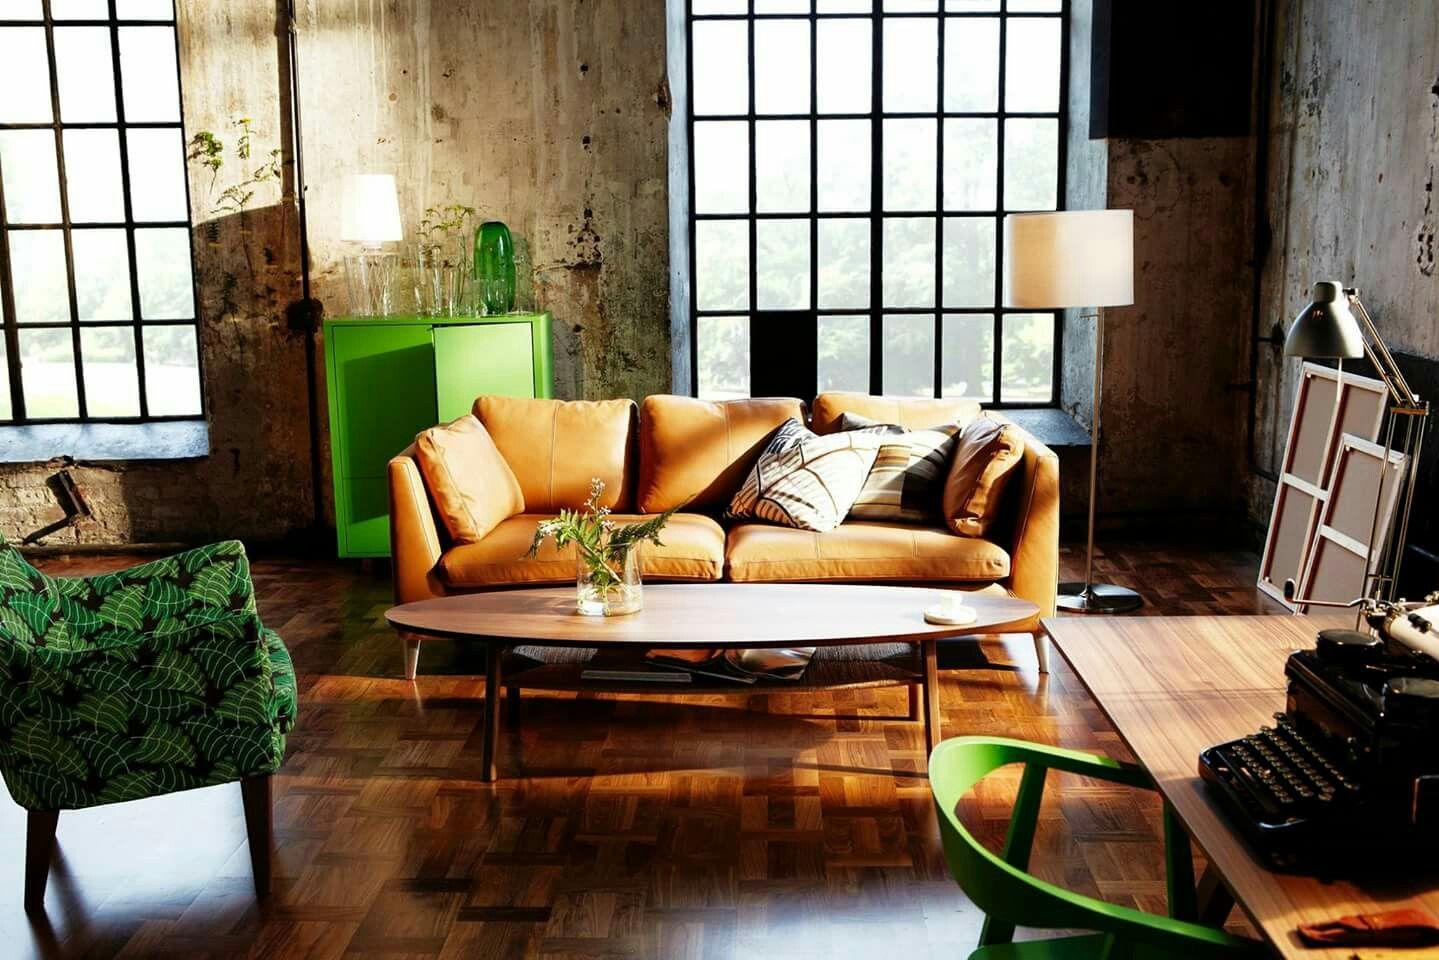 Explore Ikea Sofa Living Room Inspiration and